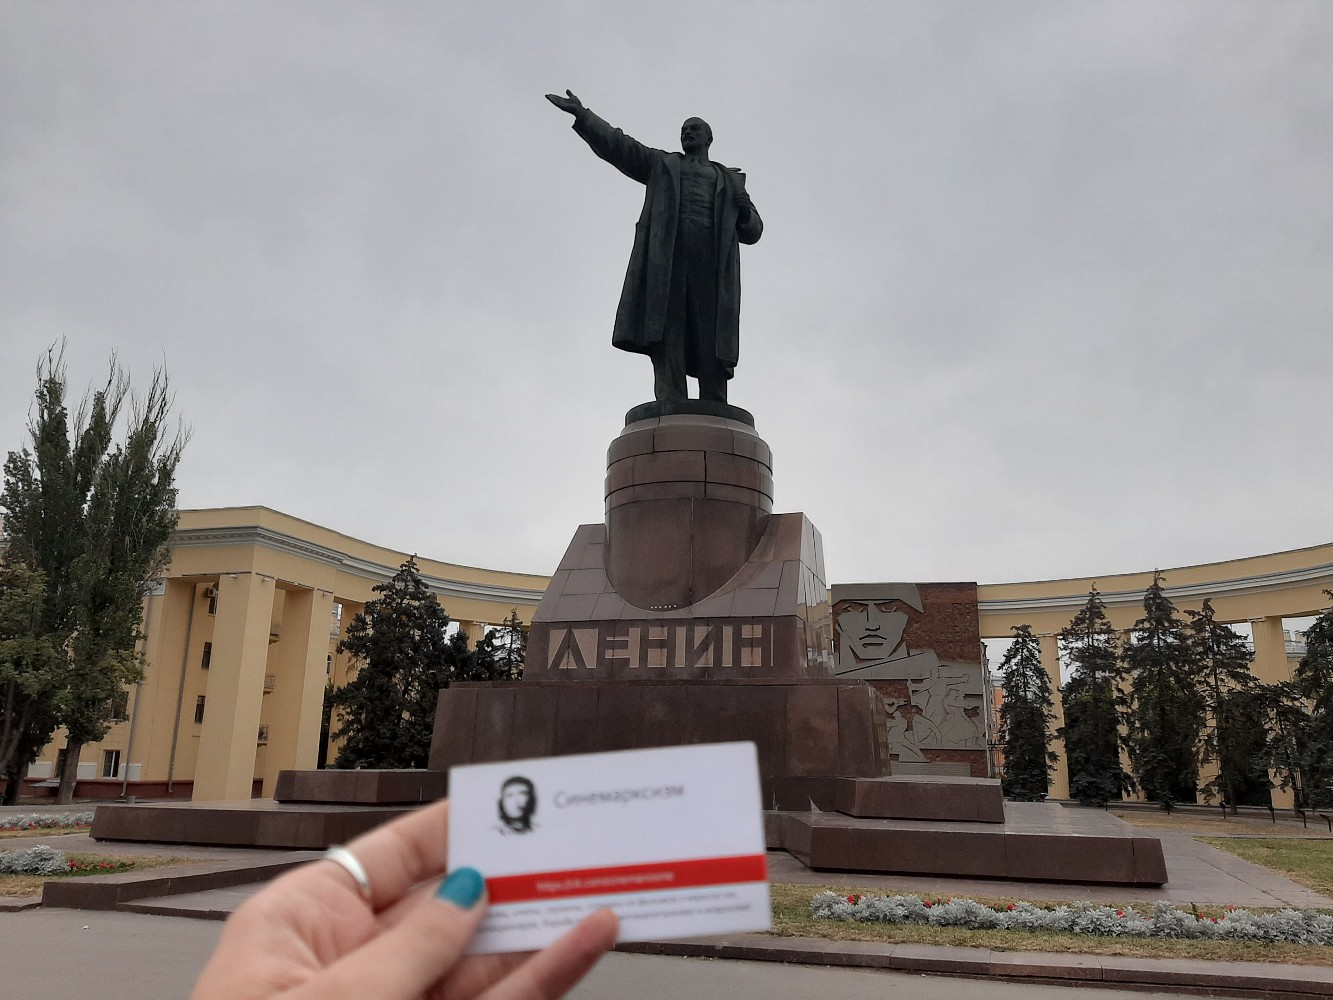 Путешествие визитки: Волгоград.